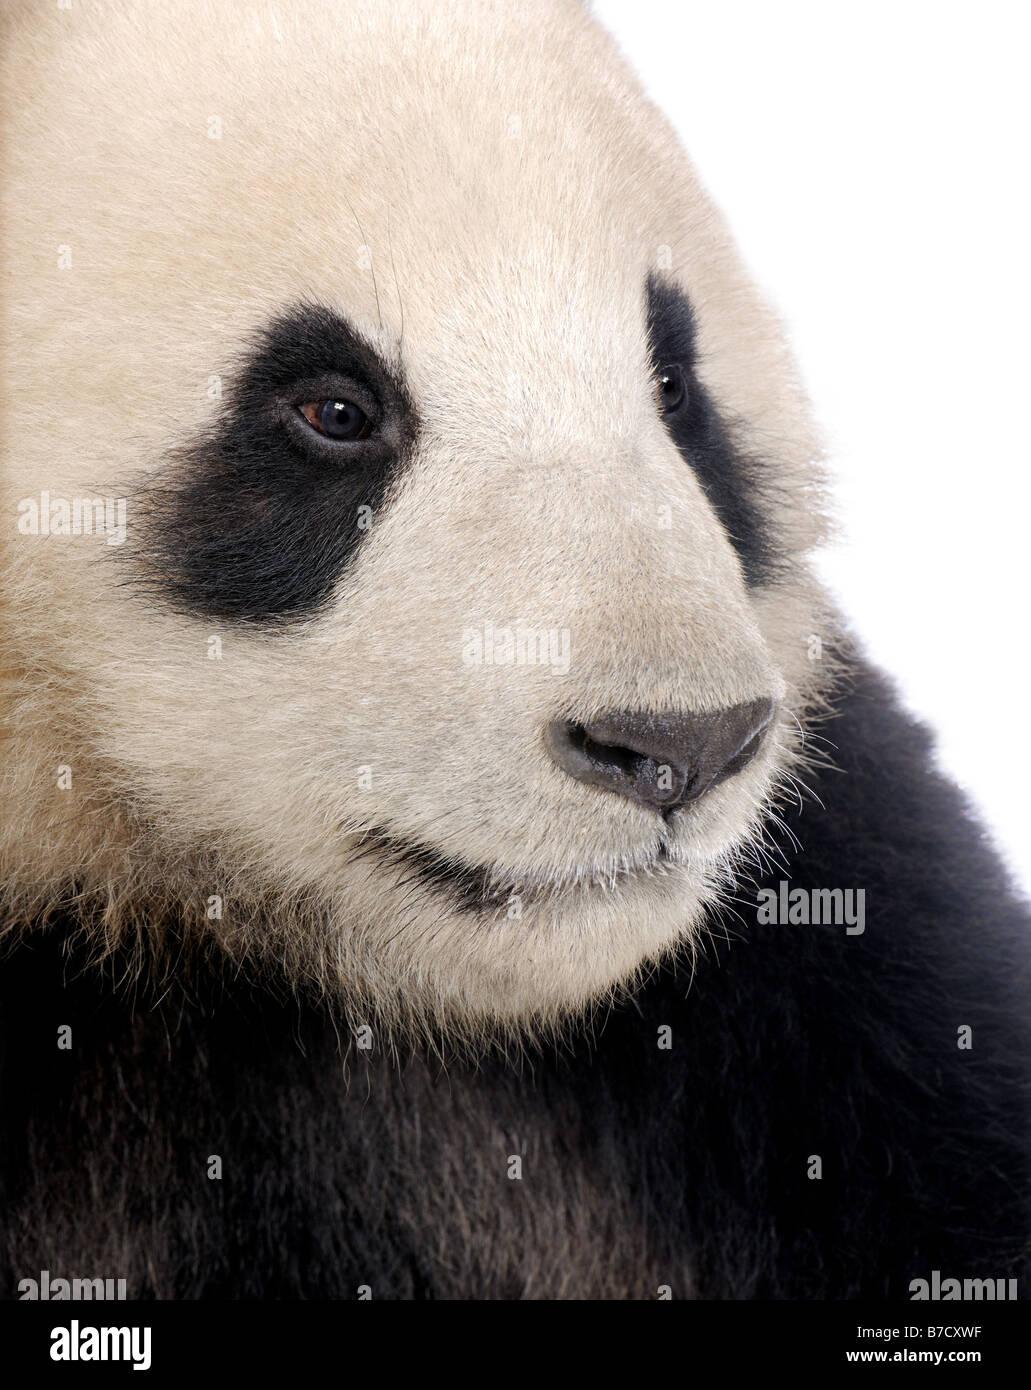 Panda géant Ailuropoda melanoleuca 18 mois devant un fond blanc Photo Stock